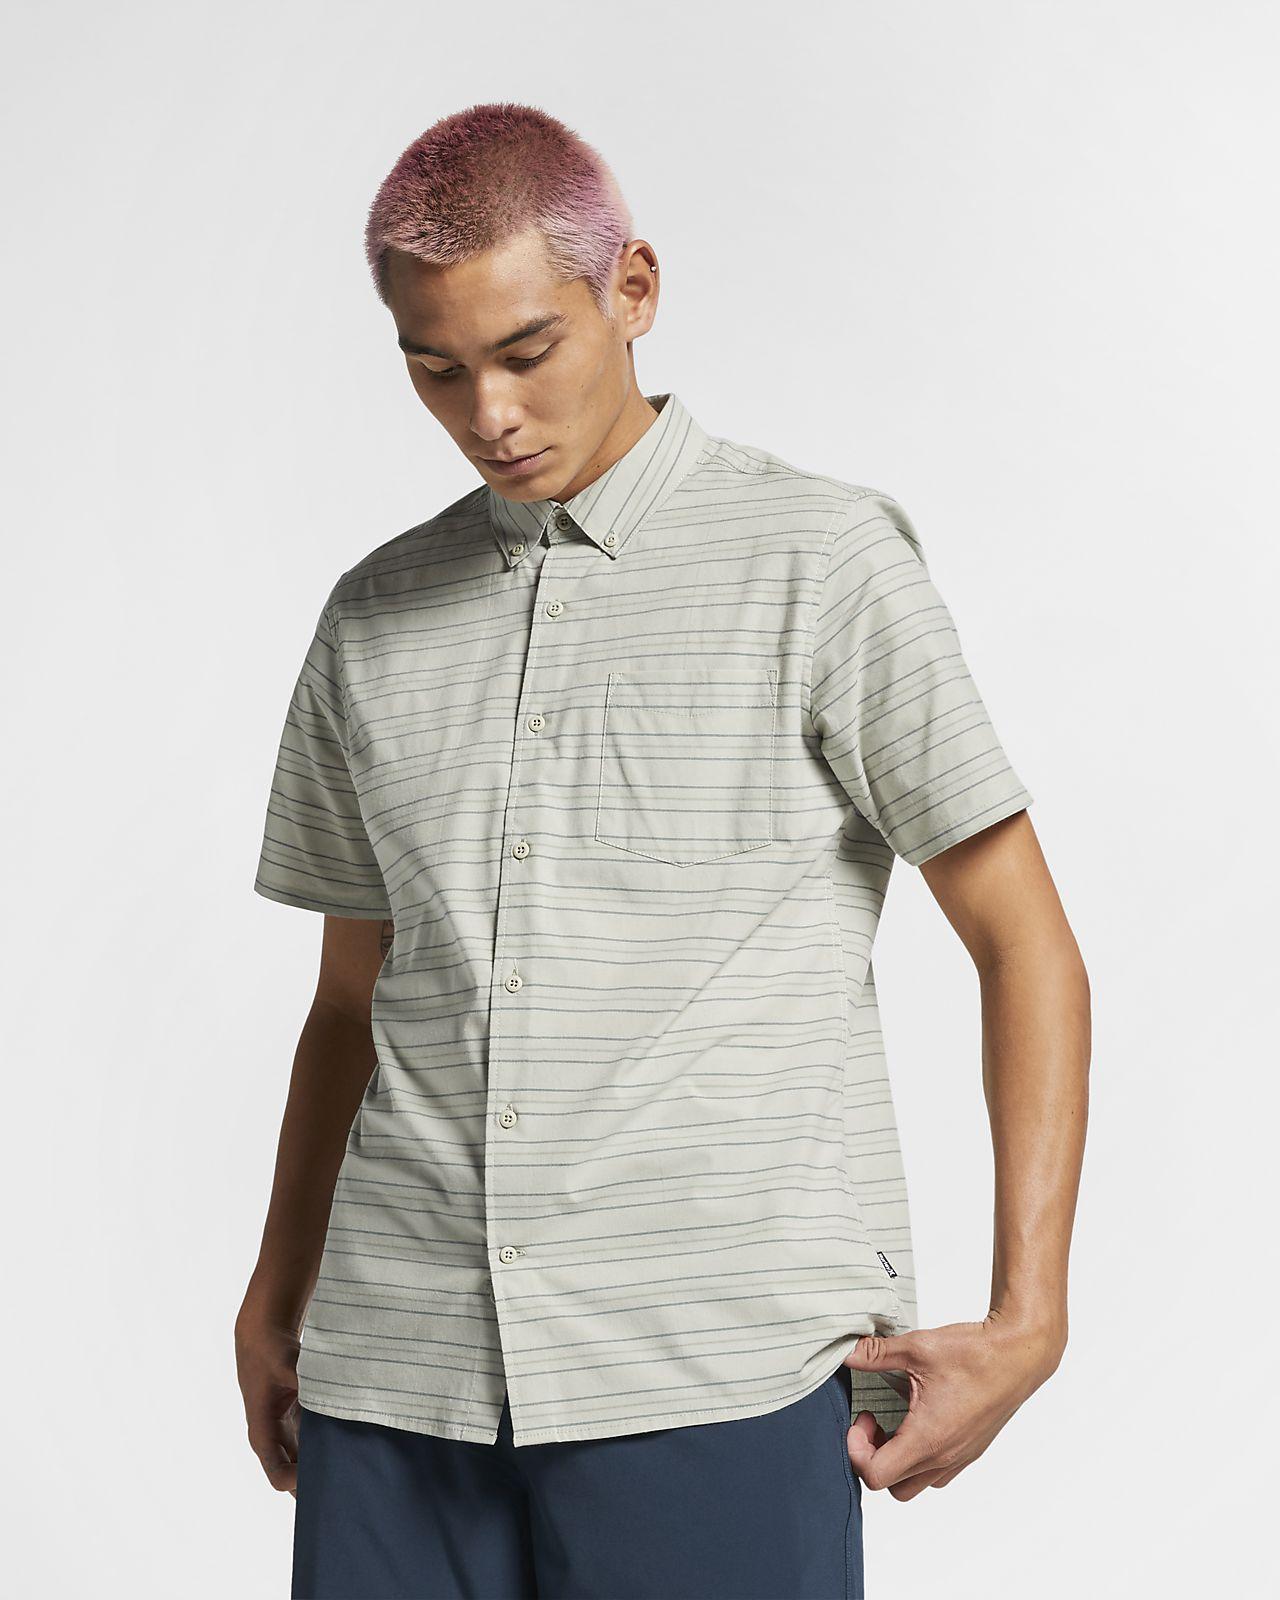 Kortärmad tröja Hurley Dri-FIT Staycay för män